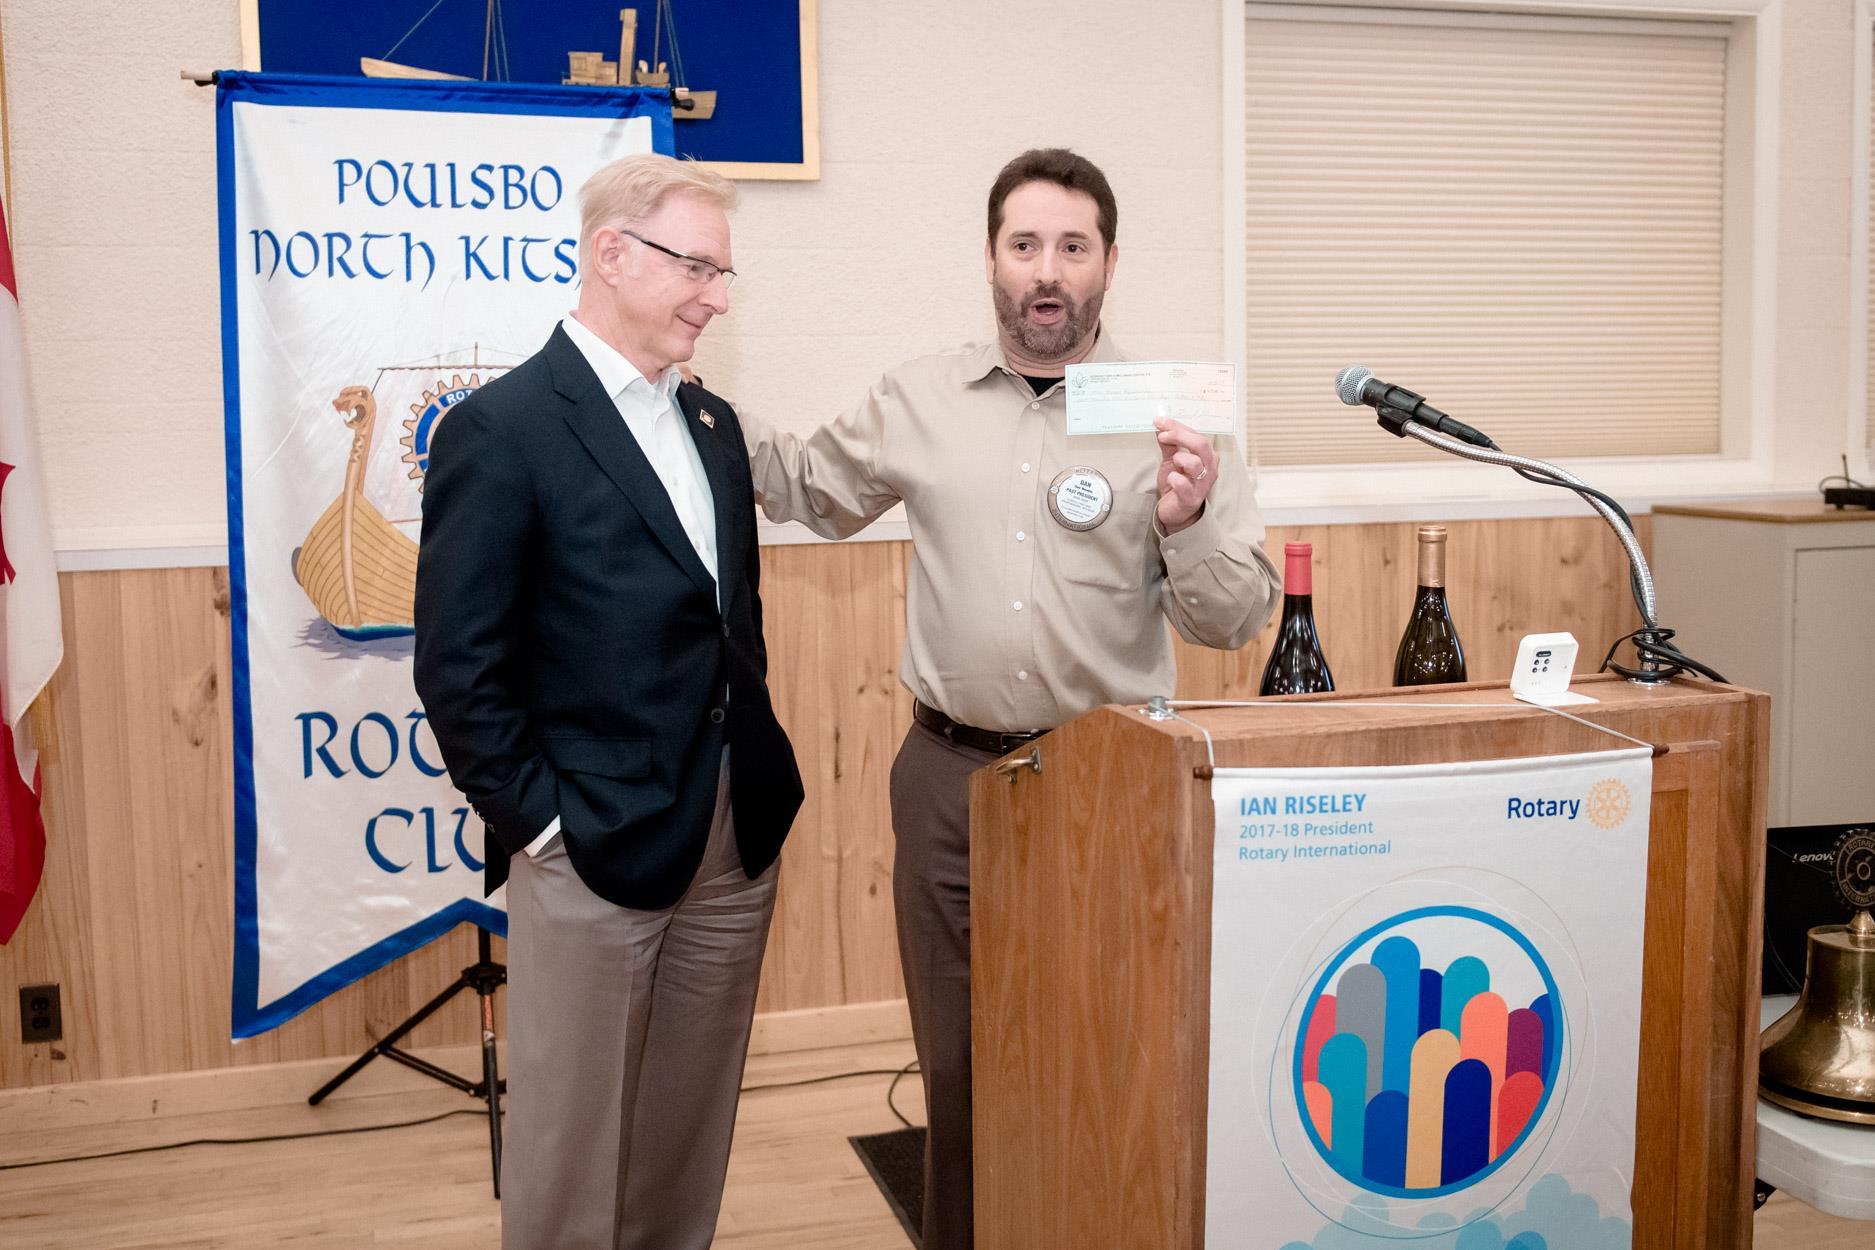 Bob Doane's contribution helps Poulsbo-NK Rotary Foundation Achieve Milestone